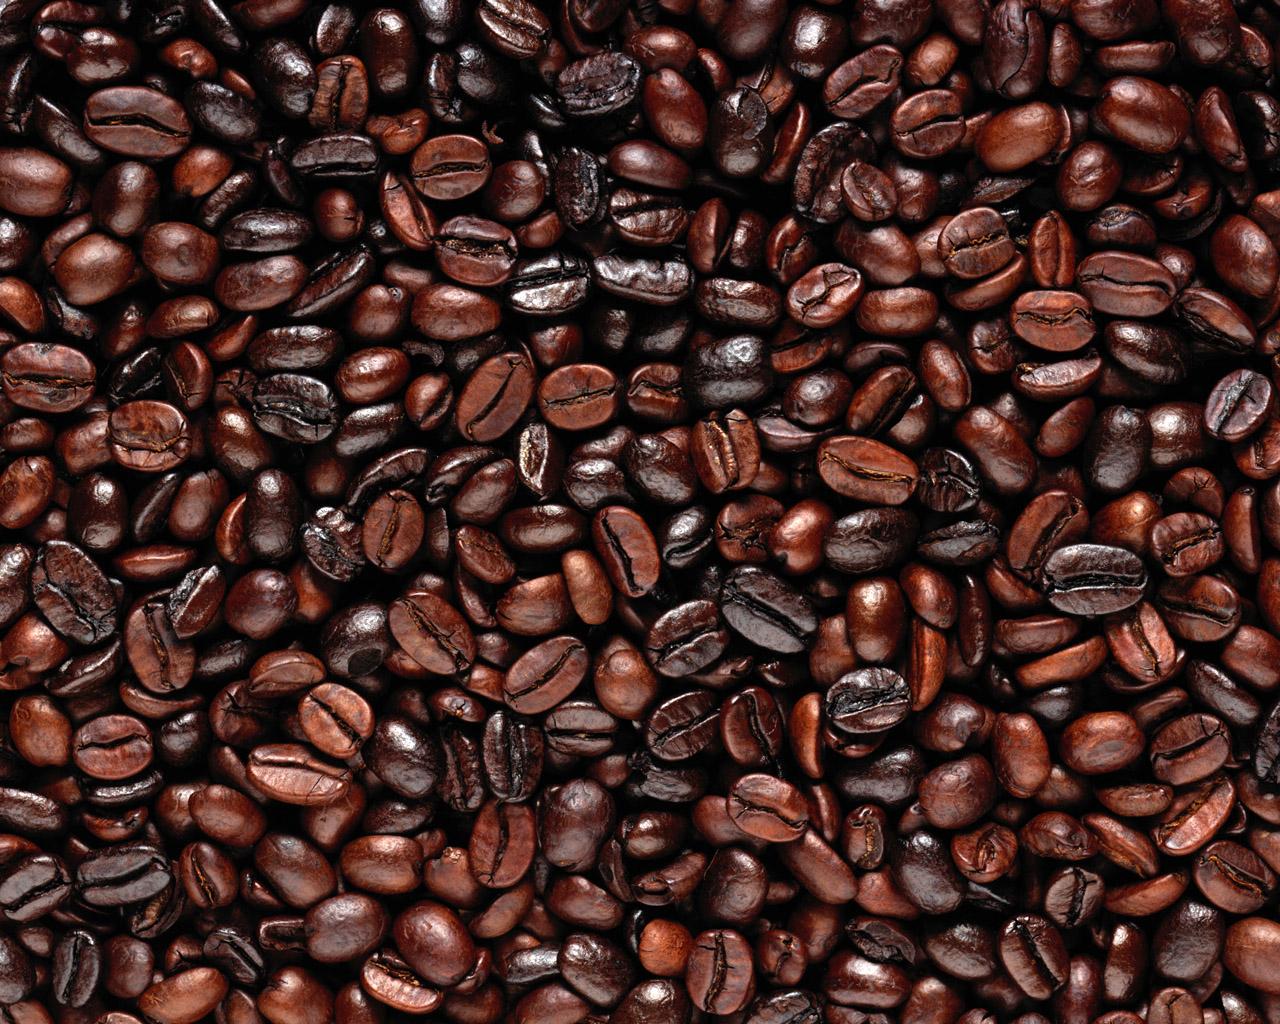 http://2.bp.blogspot.com/_Iq1fkO6qus0/TU8k7SLBryI/AAAAAAAAAx4/cKiMxUdg4z0/s1600/coffee-bean-wallpaper_7220113.jpg